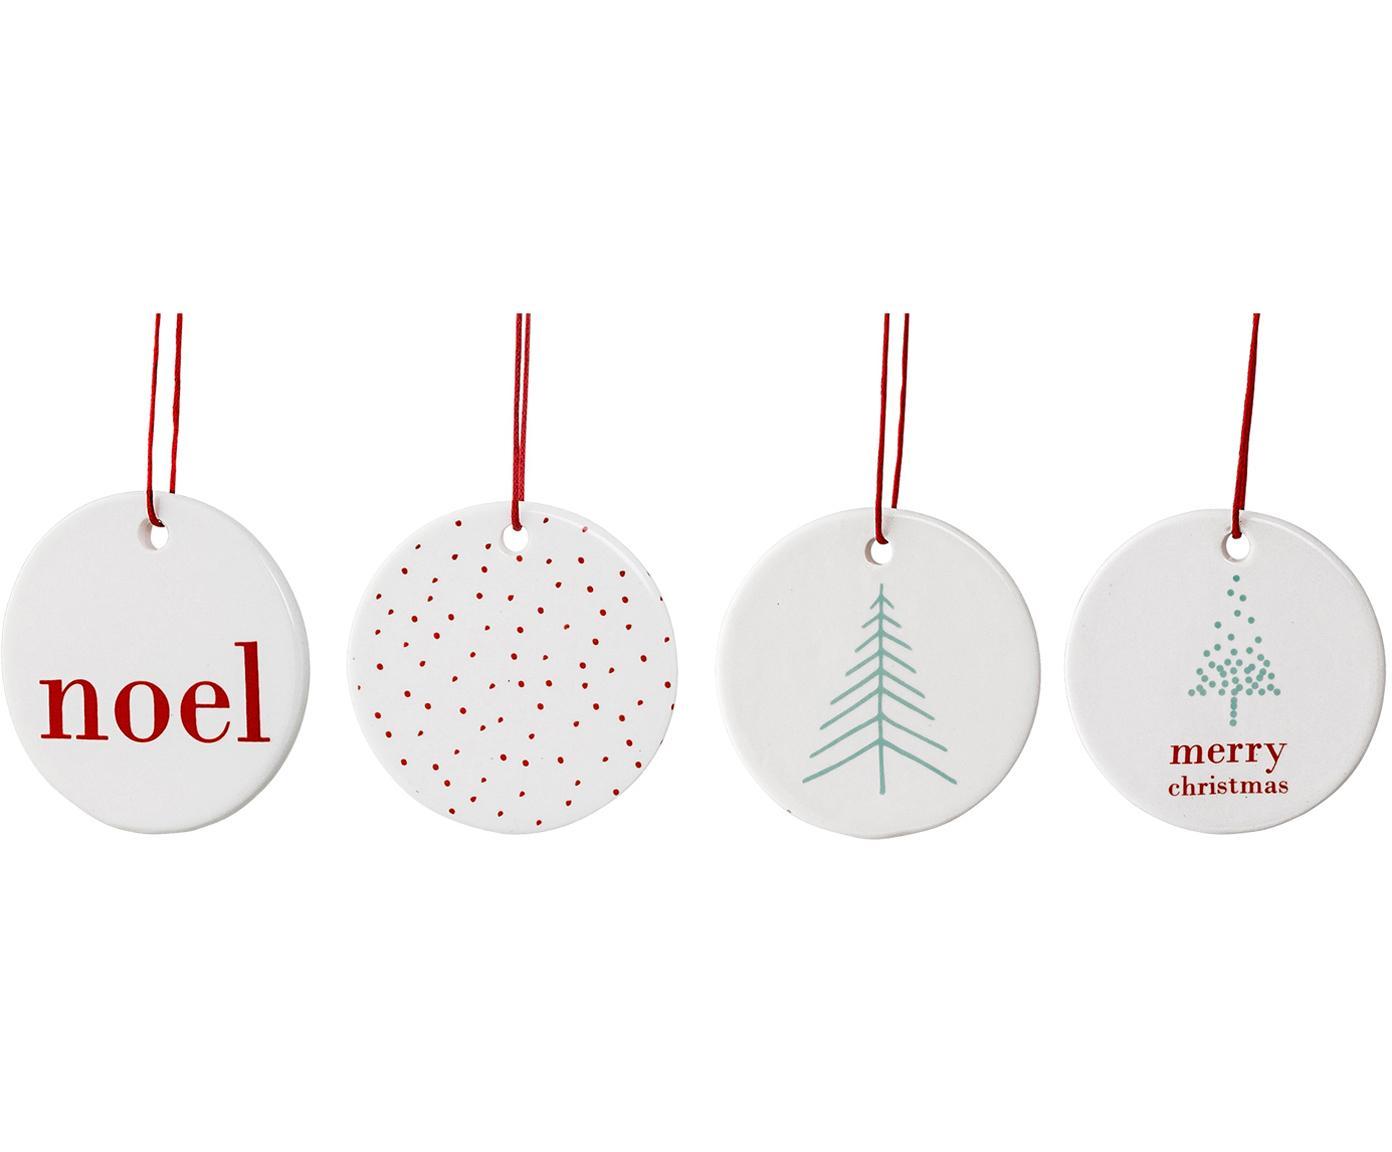 Baumanhänger-Set Christmas Days, 4-tlg., Porzellan, Weiß<br>Aufdruck: Rot, Minze, Ø 6 cm